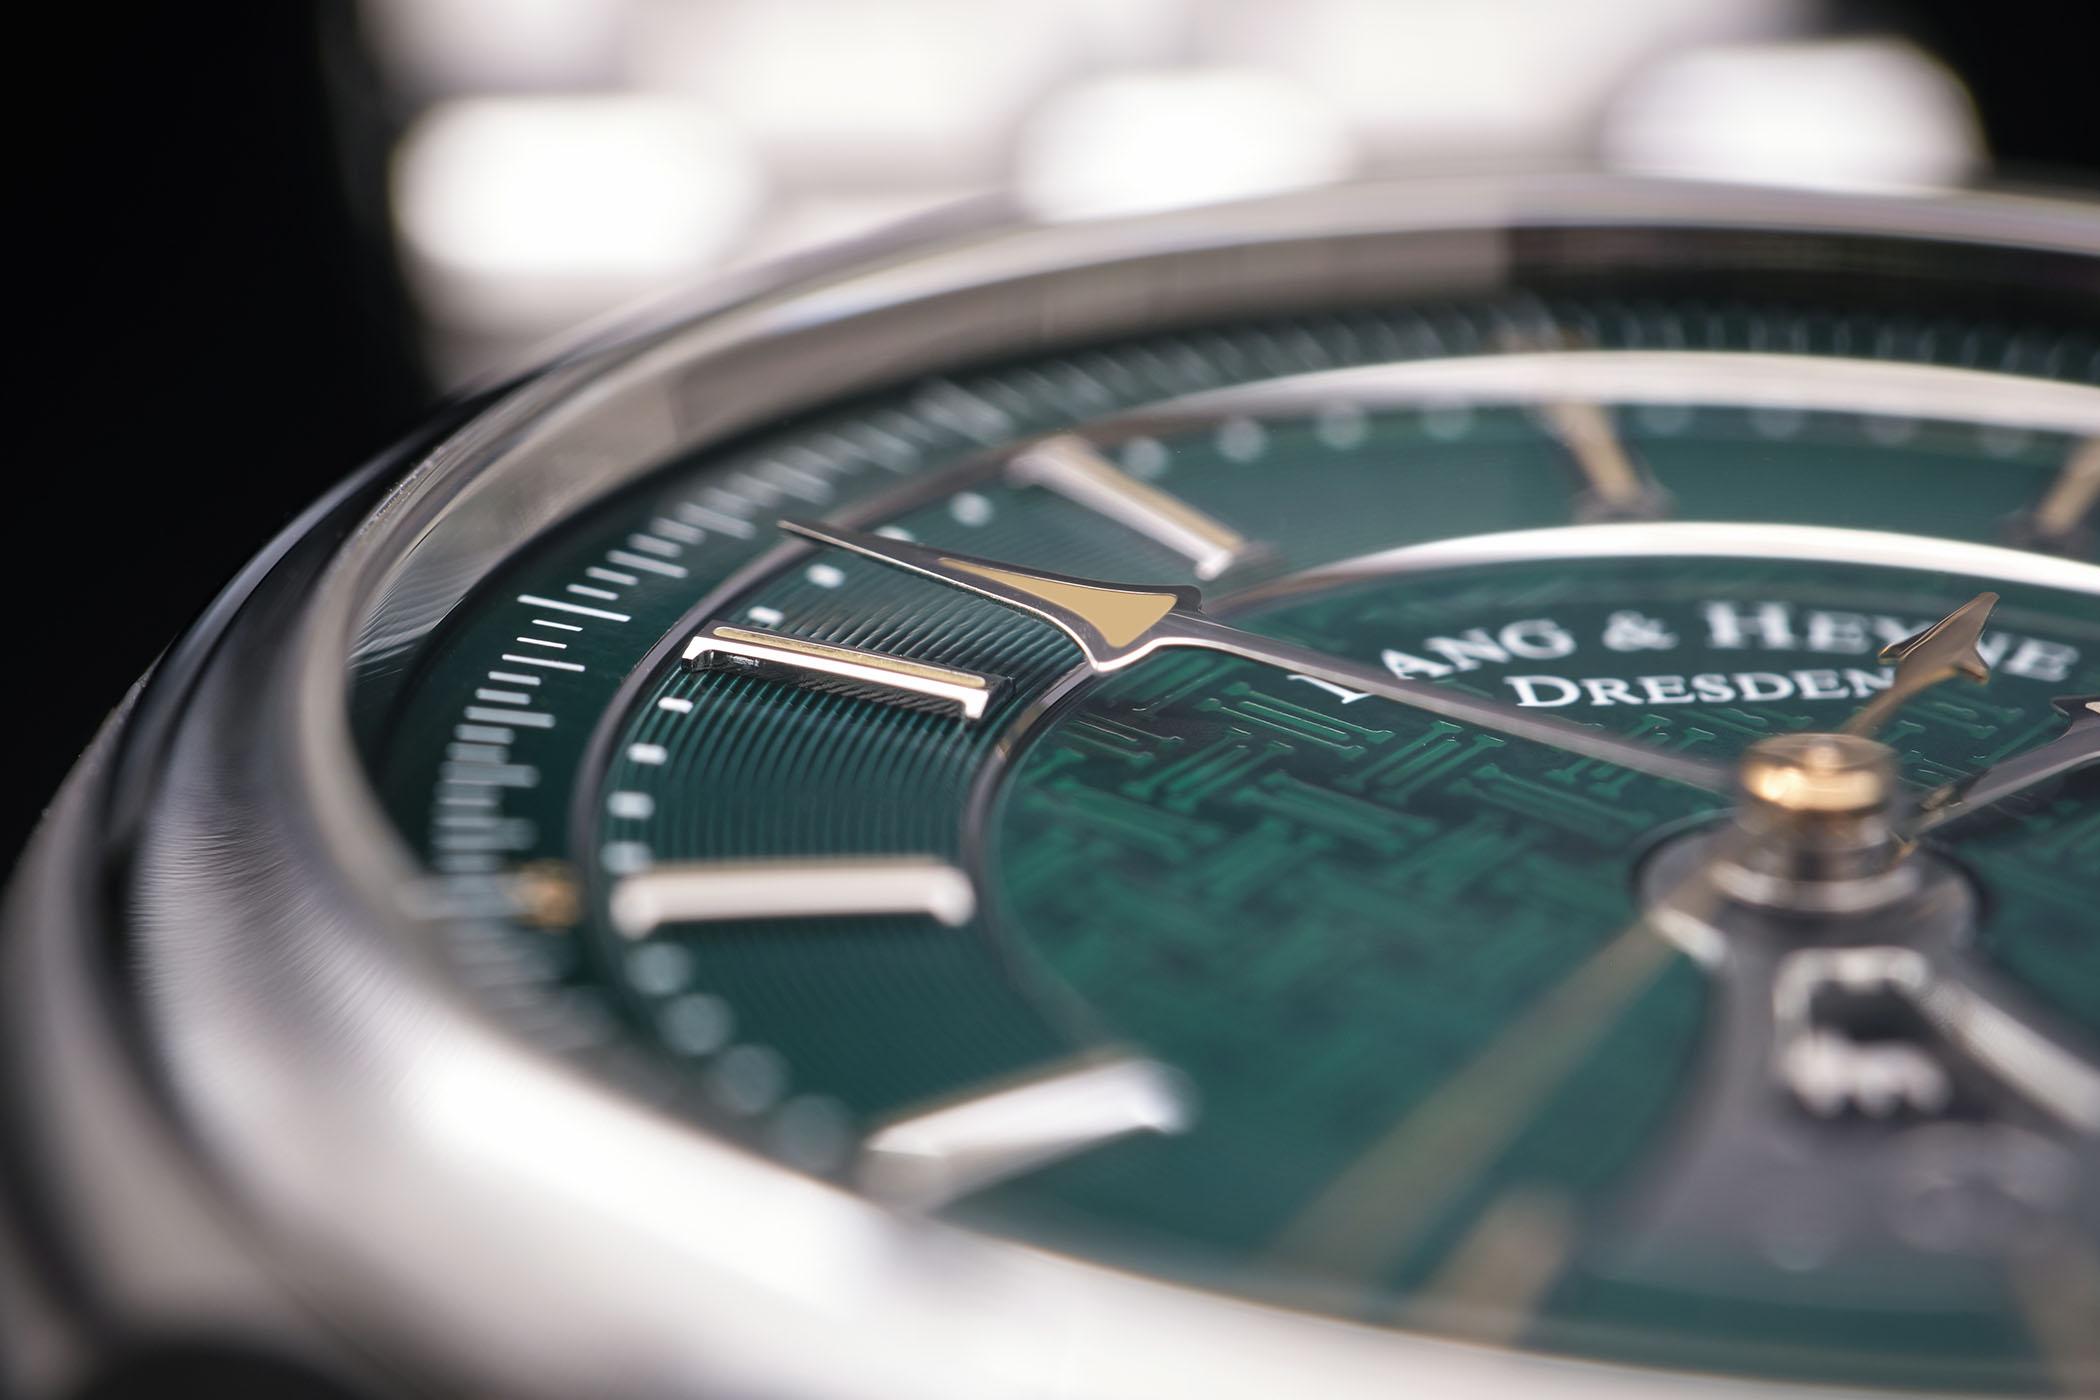 Lang & Heyne Hektor Sports Watch With Integrated Bracelet